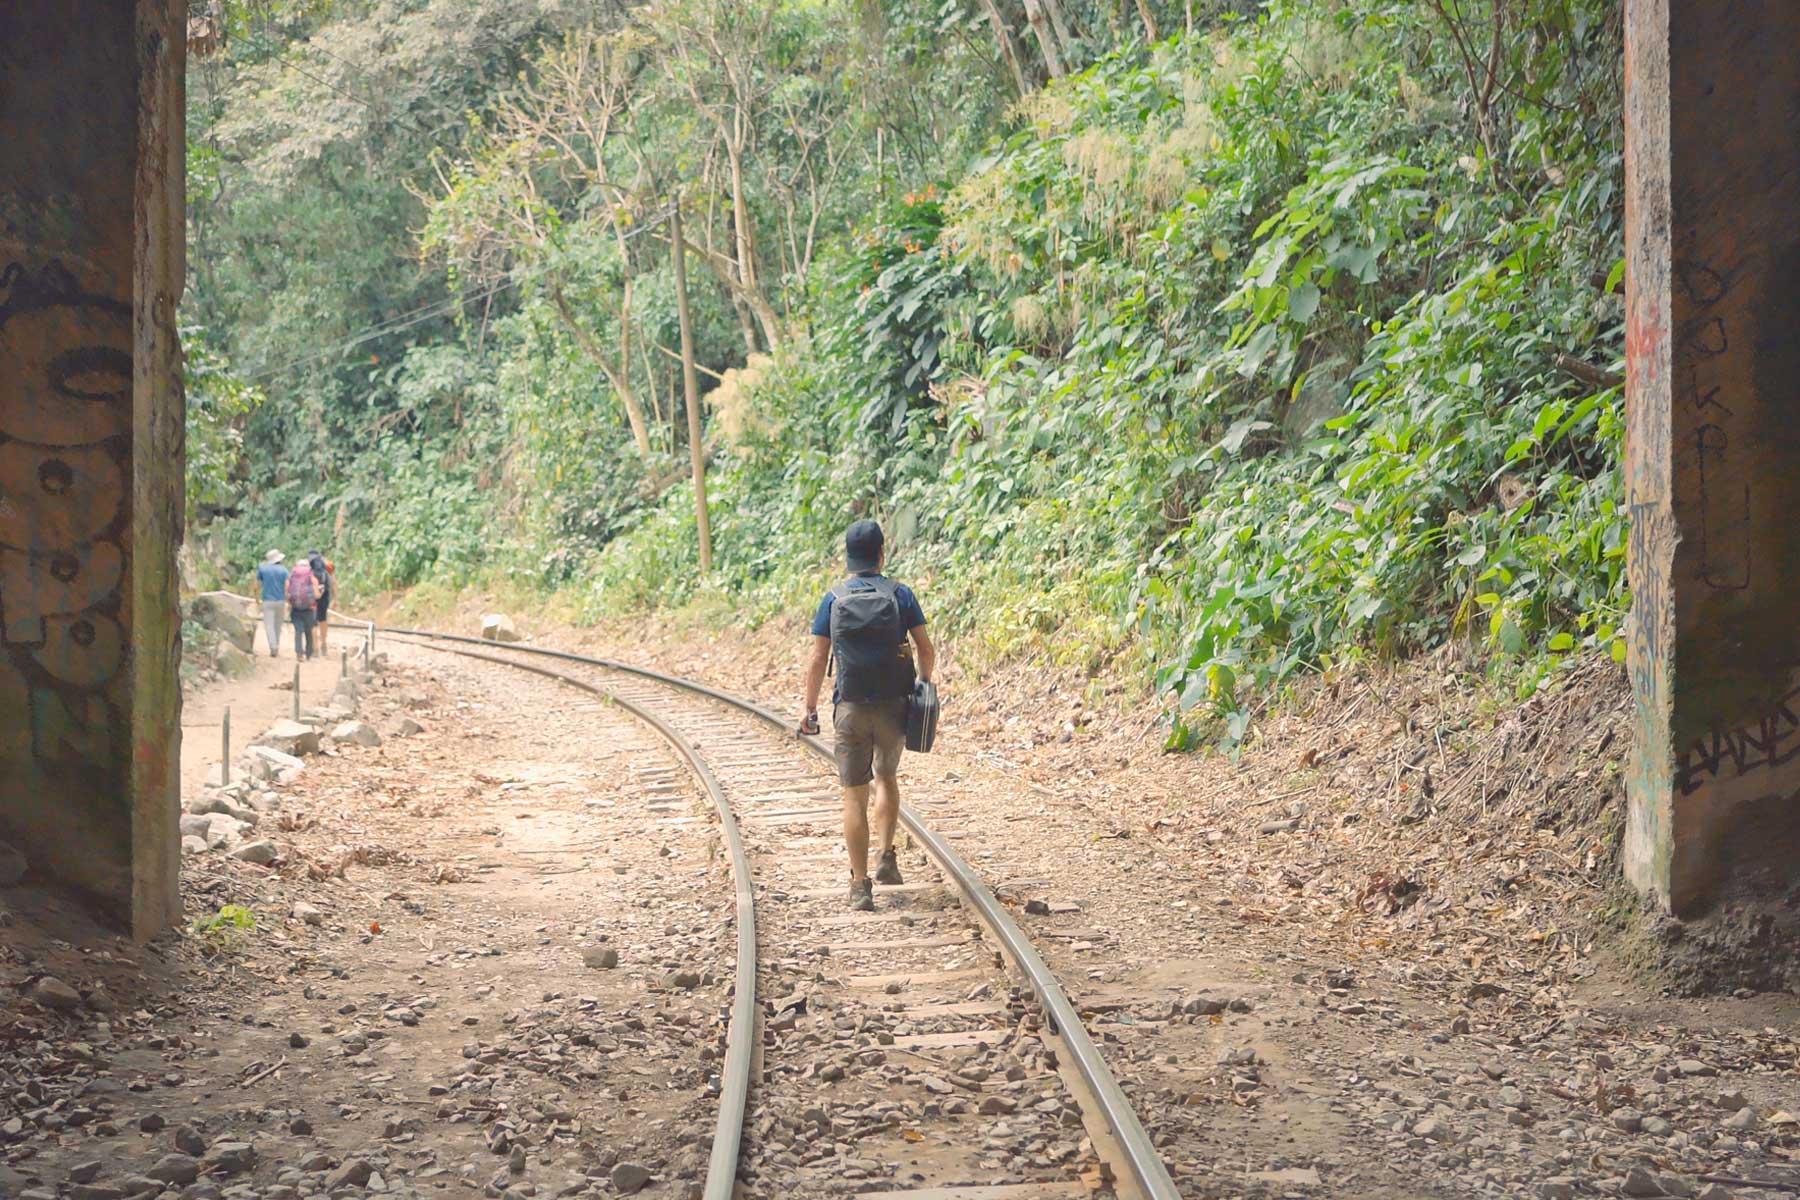 Caminando por la ruta del tren a Machu Picchu